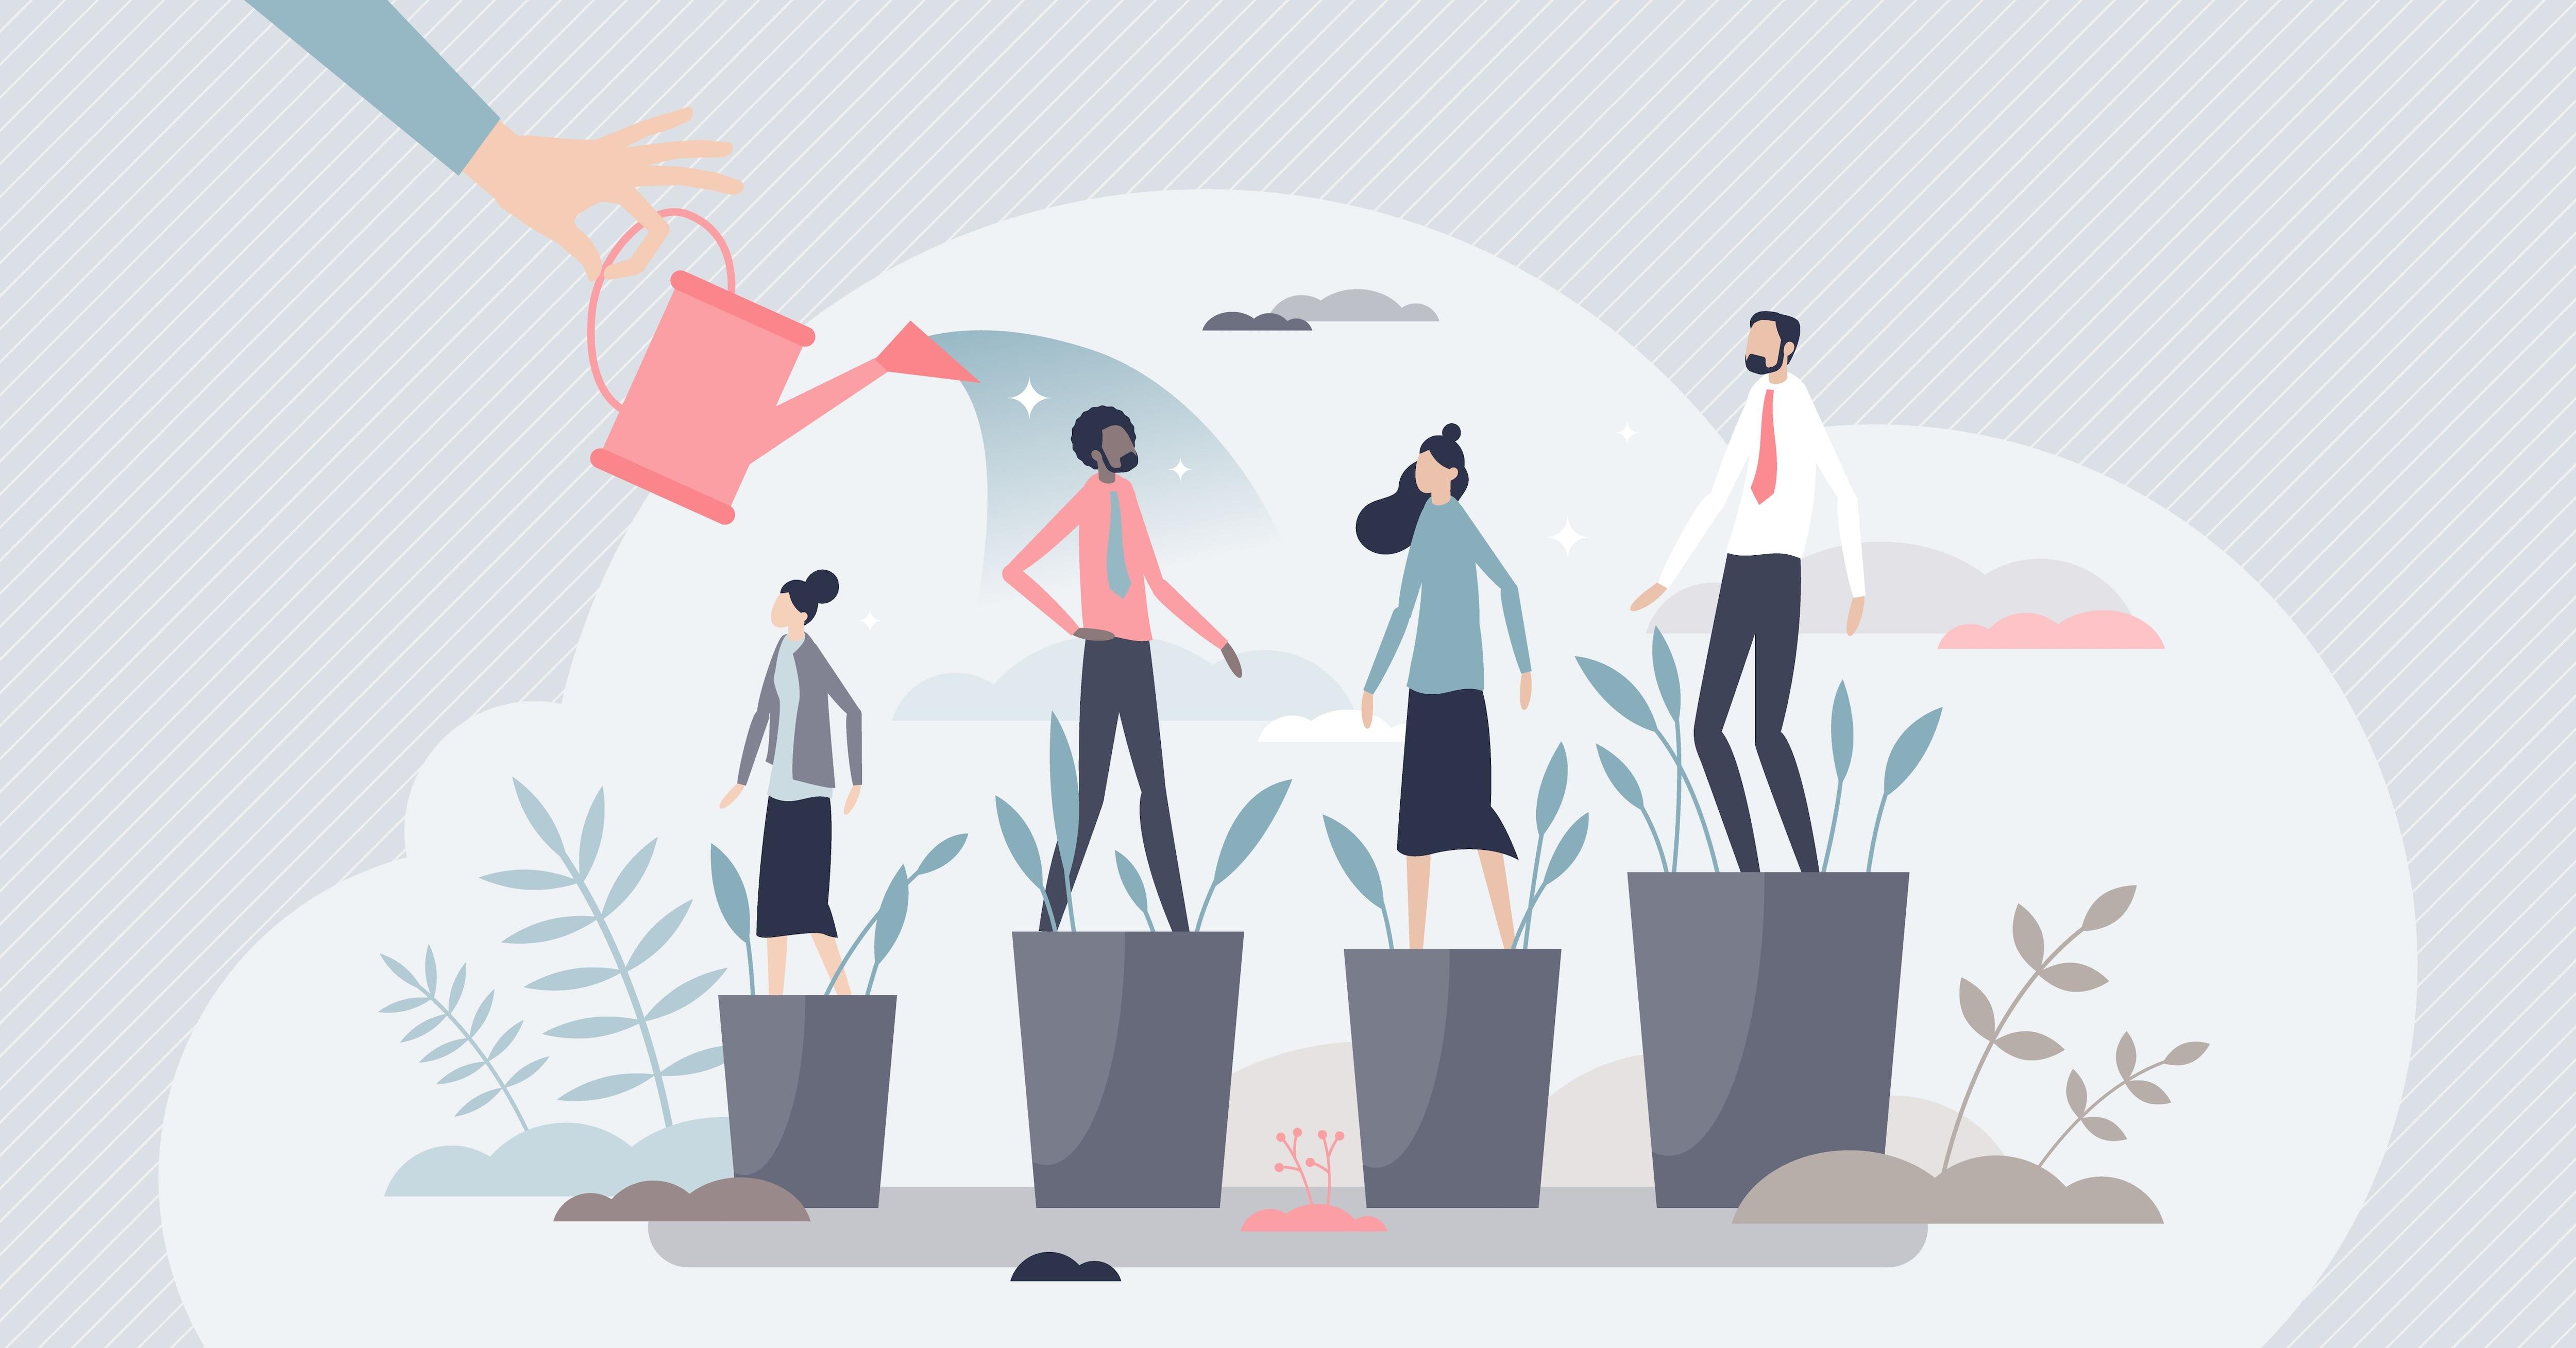 Los siete tips para vencer el miedo a tu jefe o jefa